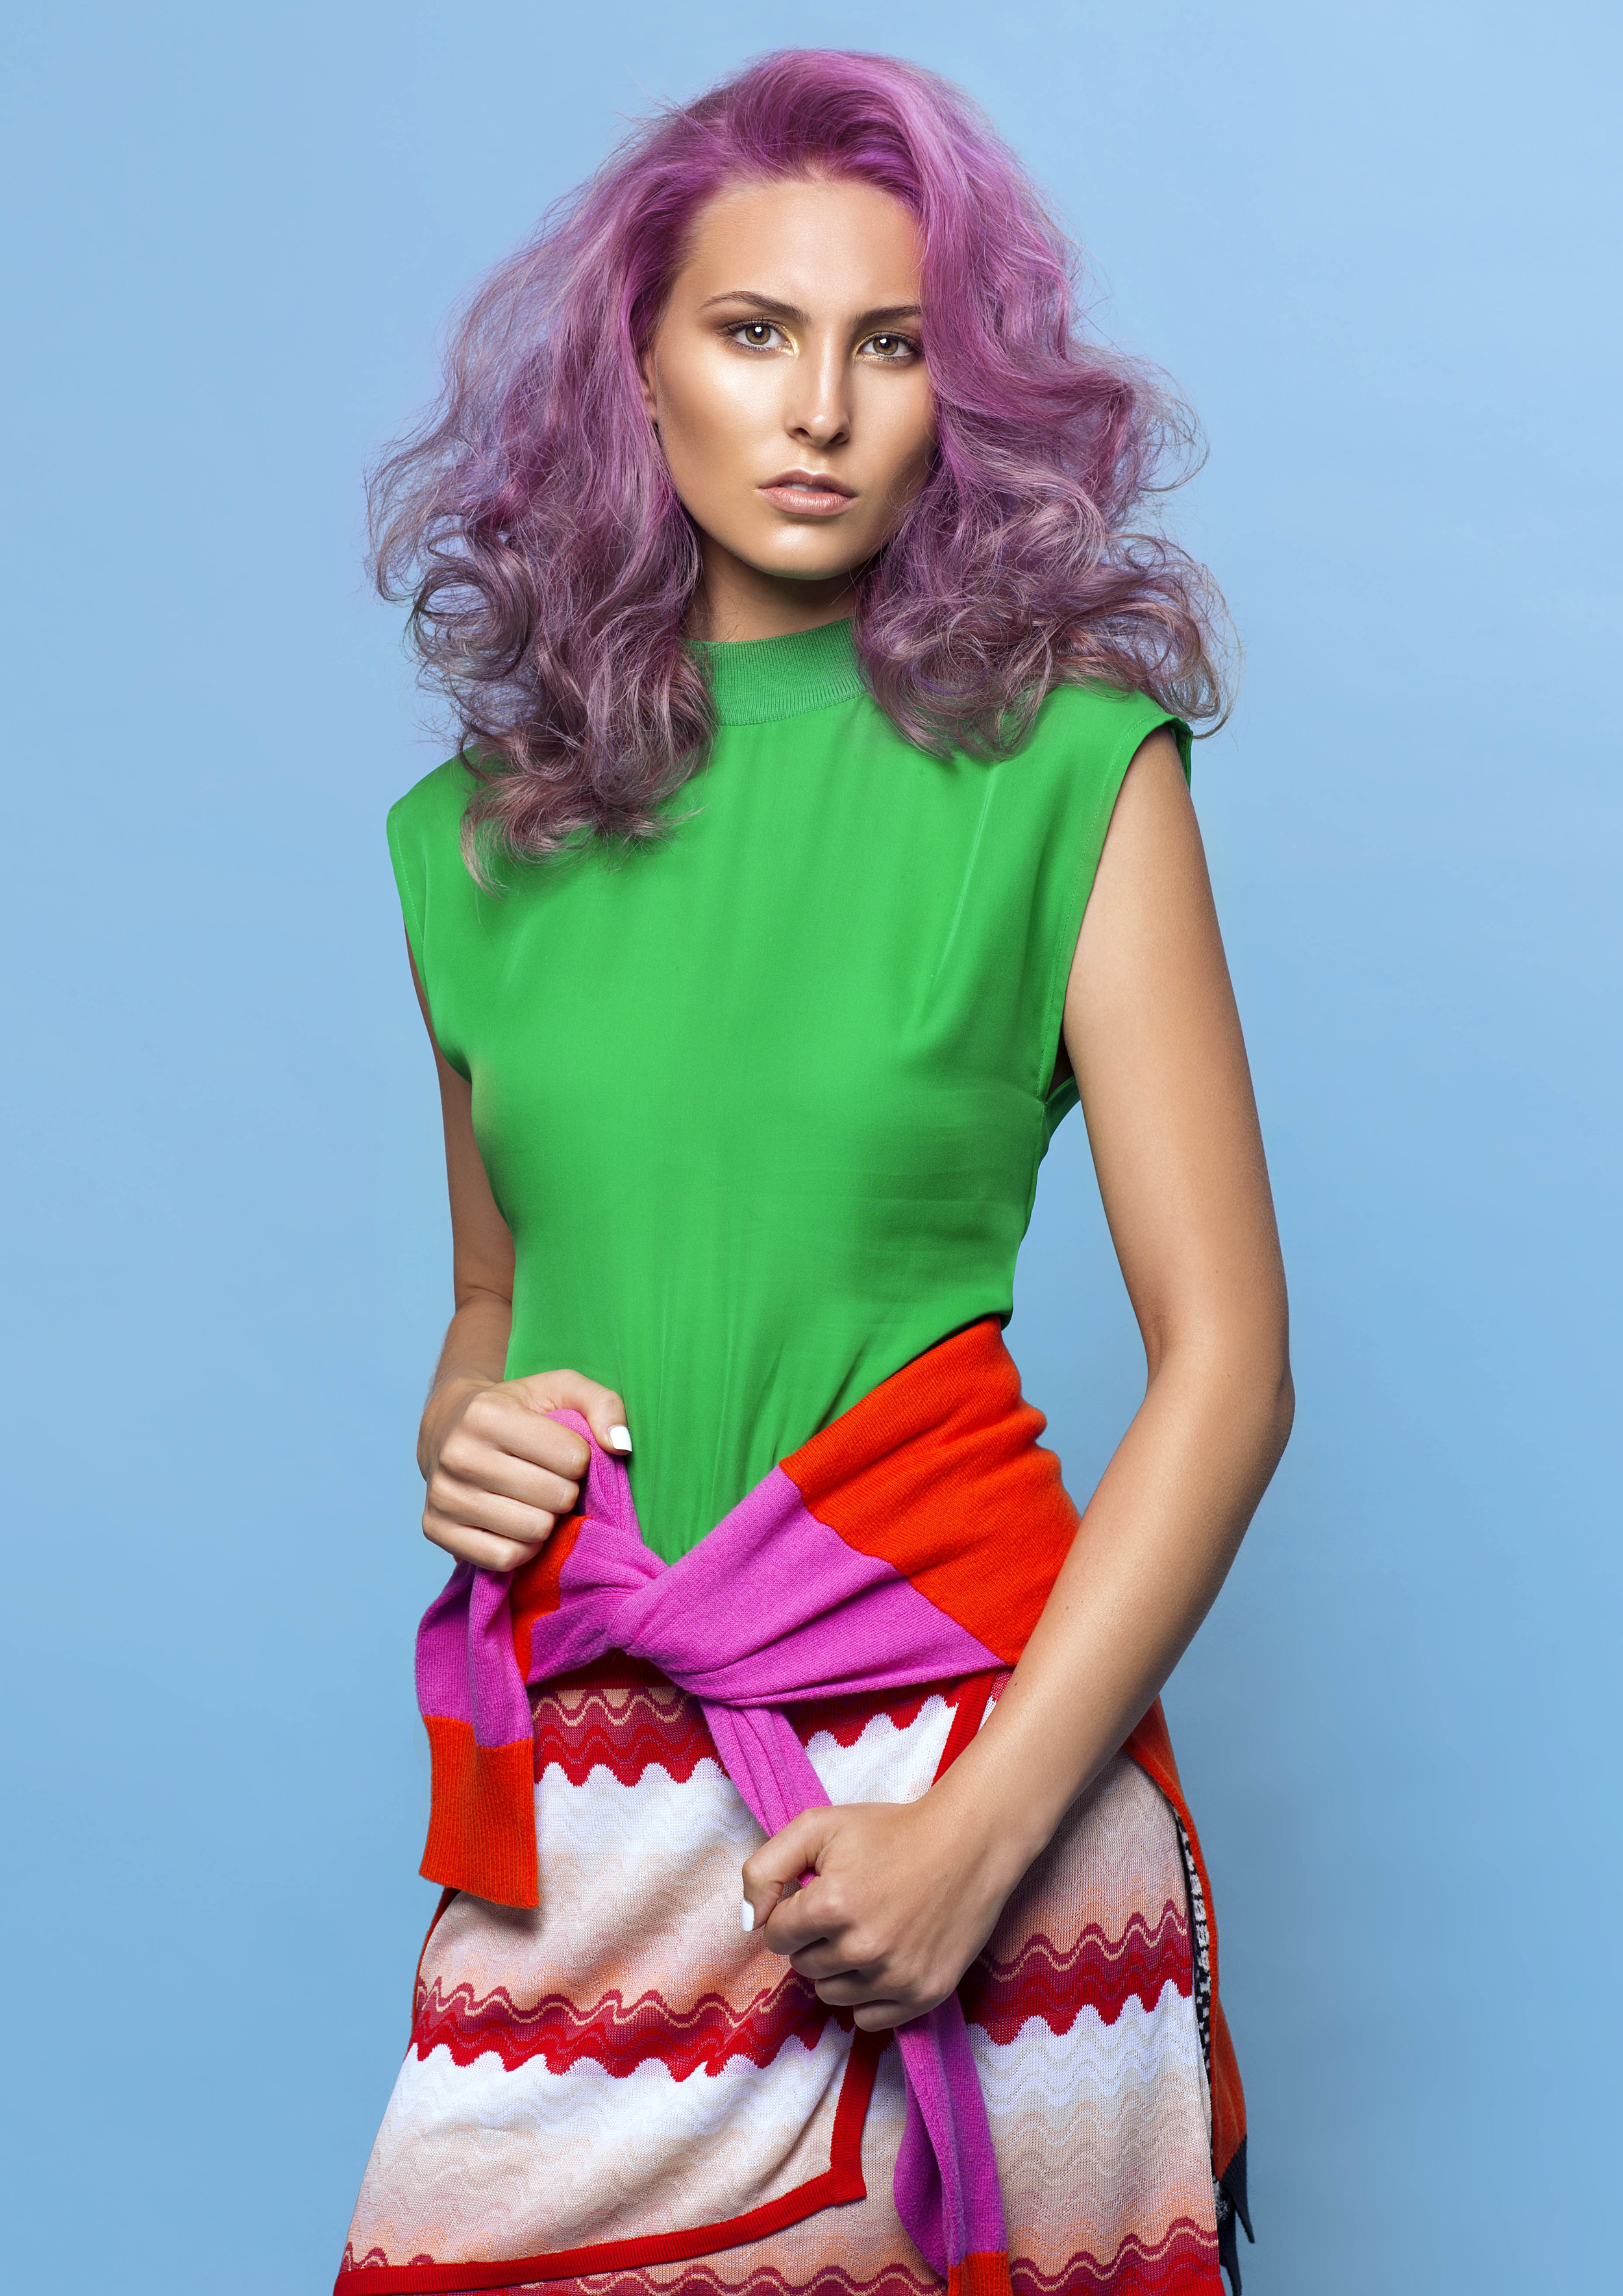 Queensland Hairdresser Andre Faiva Image_01.jpg